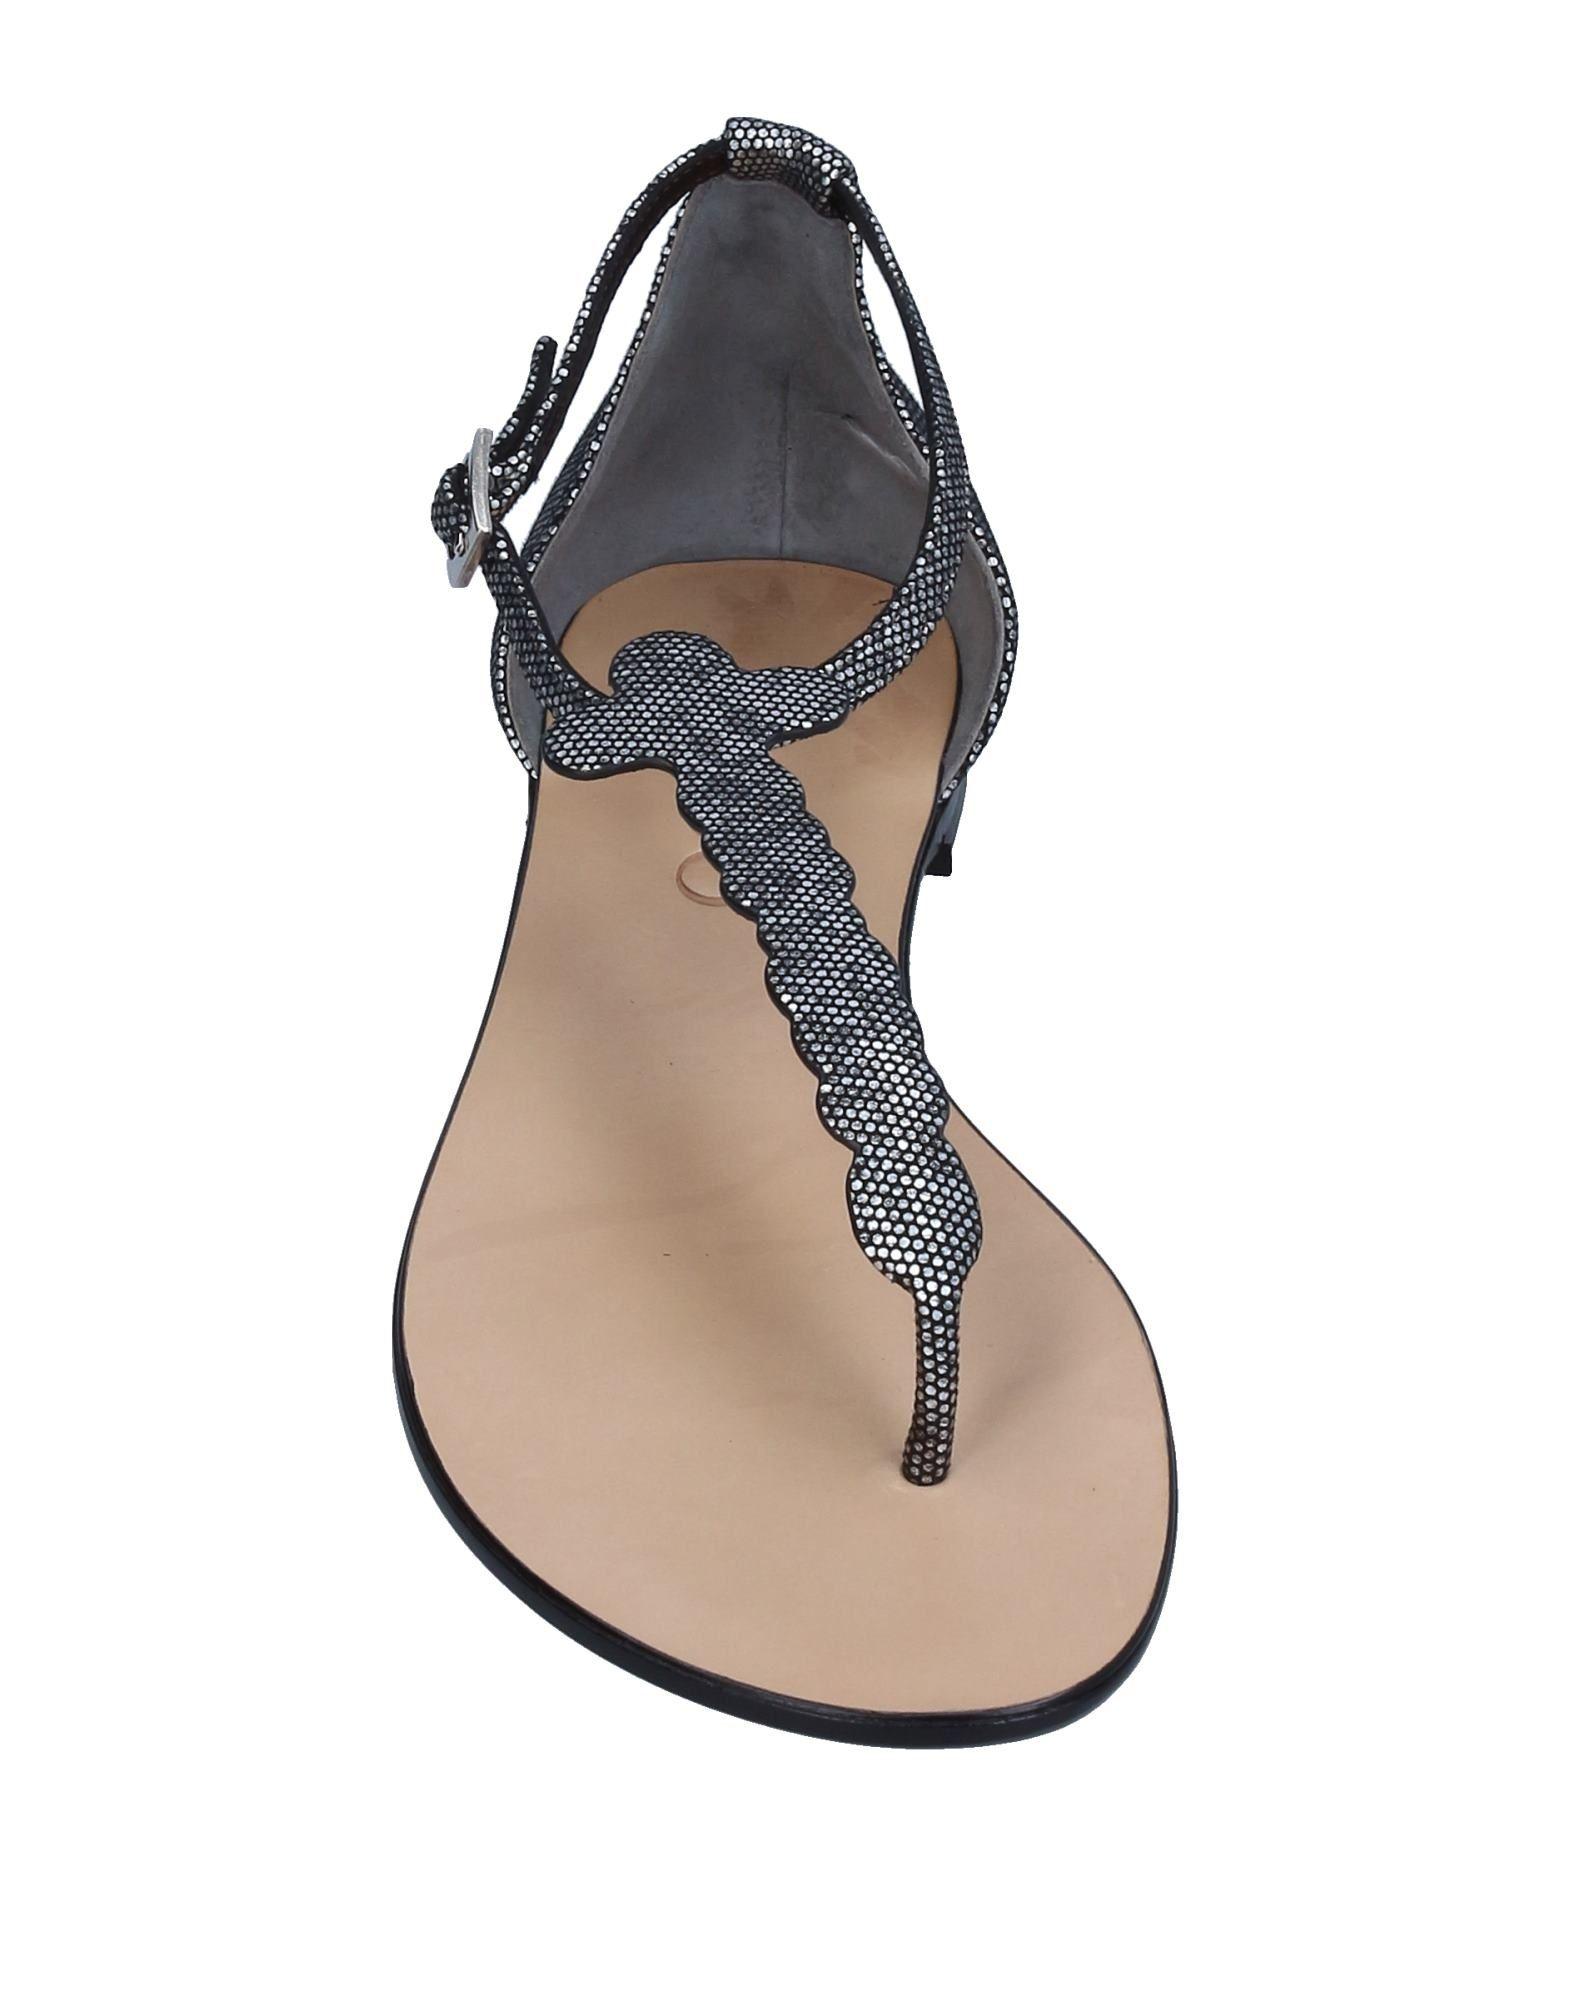 Rodo Dianetten Schuhe Damen  11351837XE Heiße Schuhe Dianetten 0e59a5